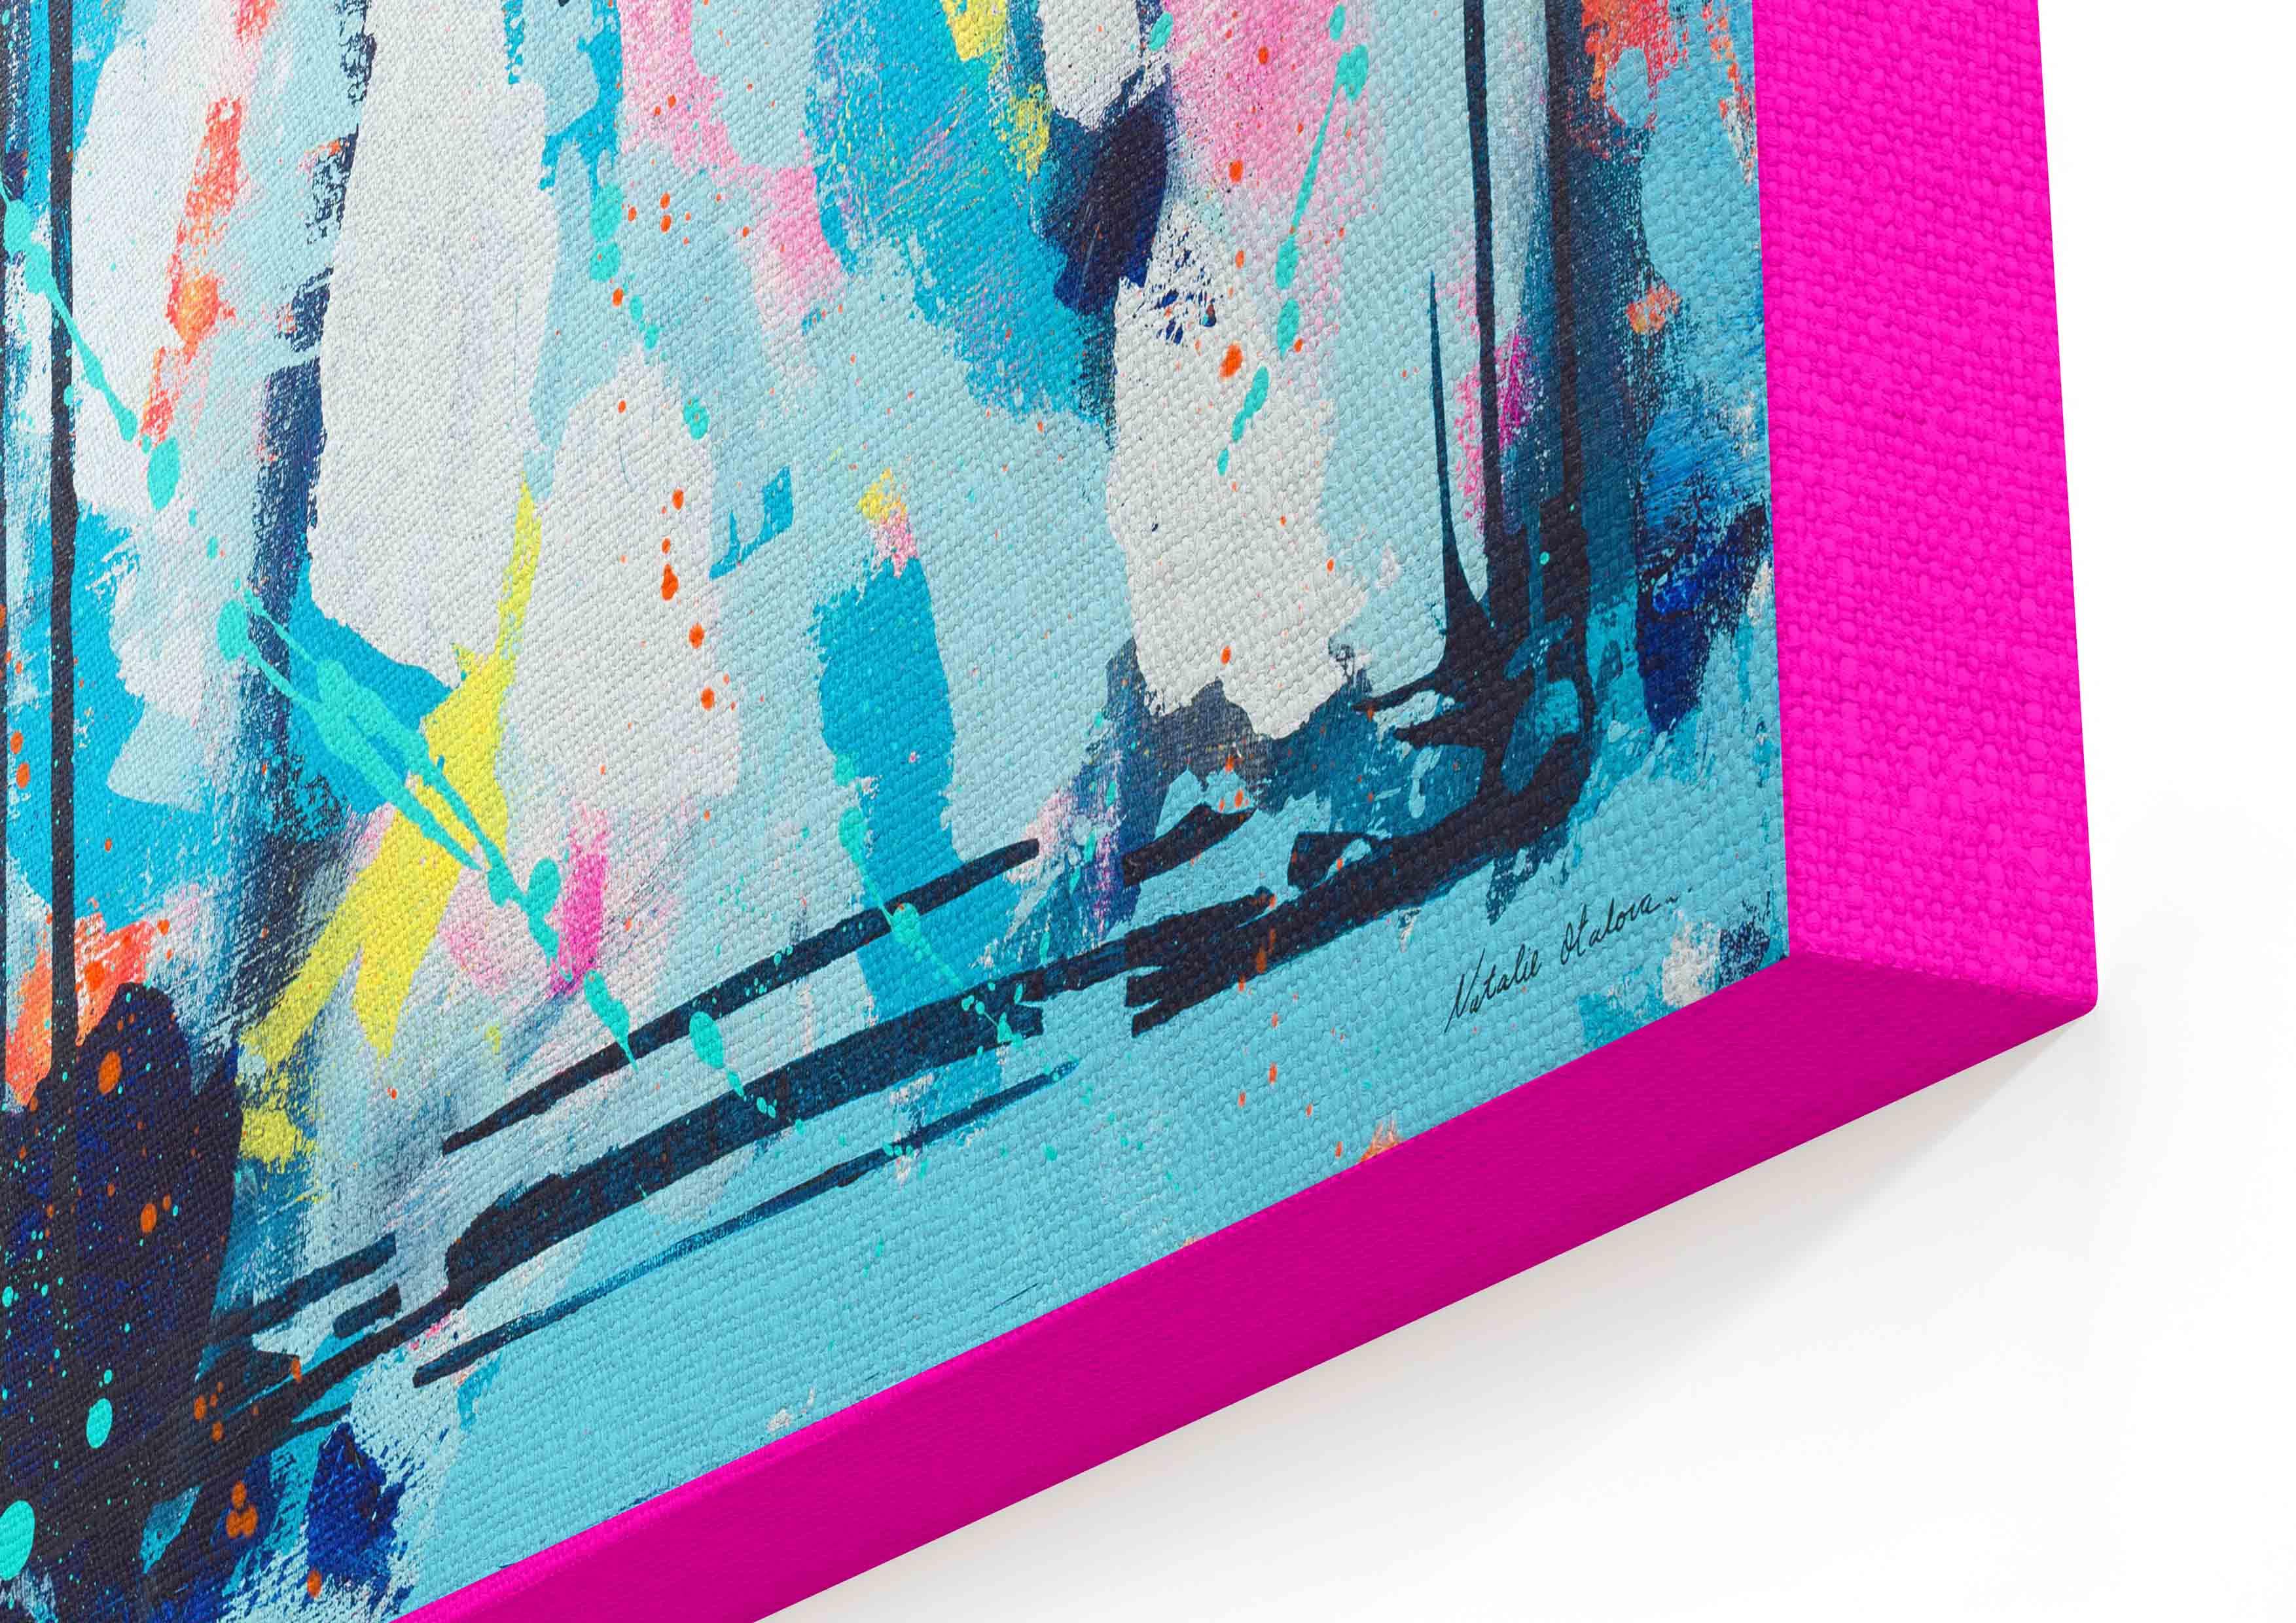 ART-PAINT-CHANEL-PERFUME-SWEET-COKTAIL-CANVAS-DETAIL-3